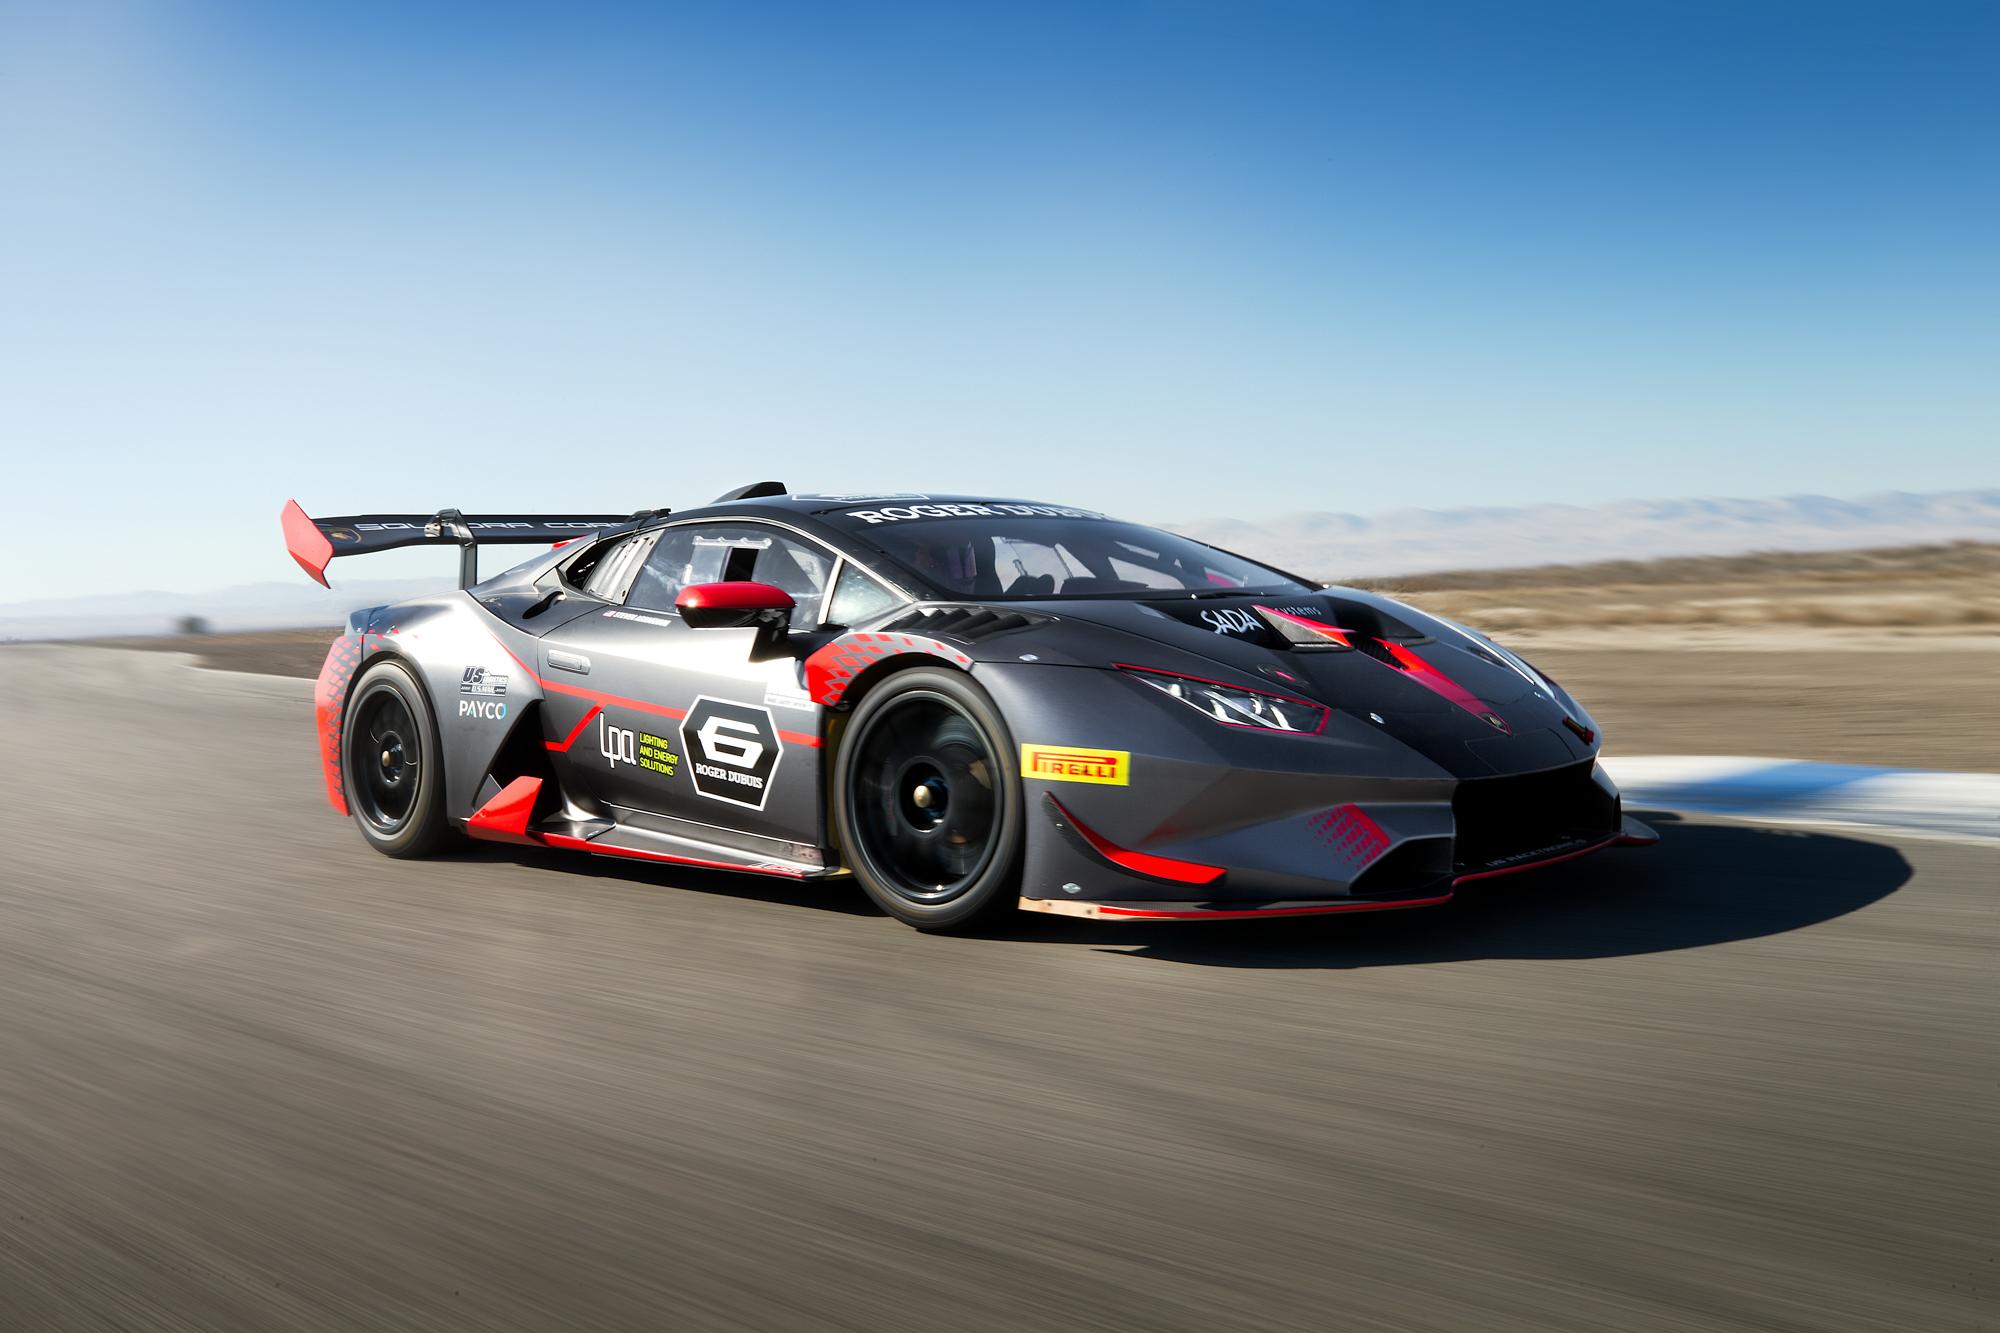 Steven-Racing-20180221-70238-2.jpg